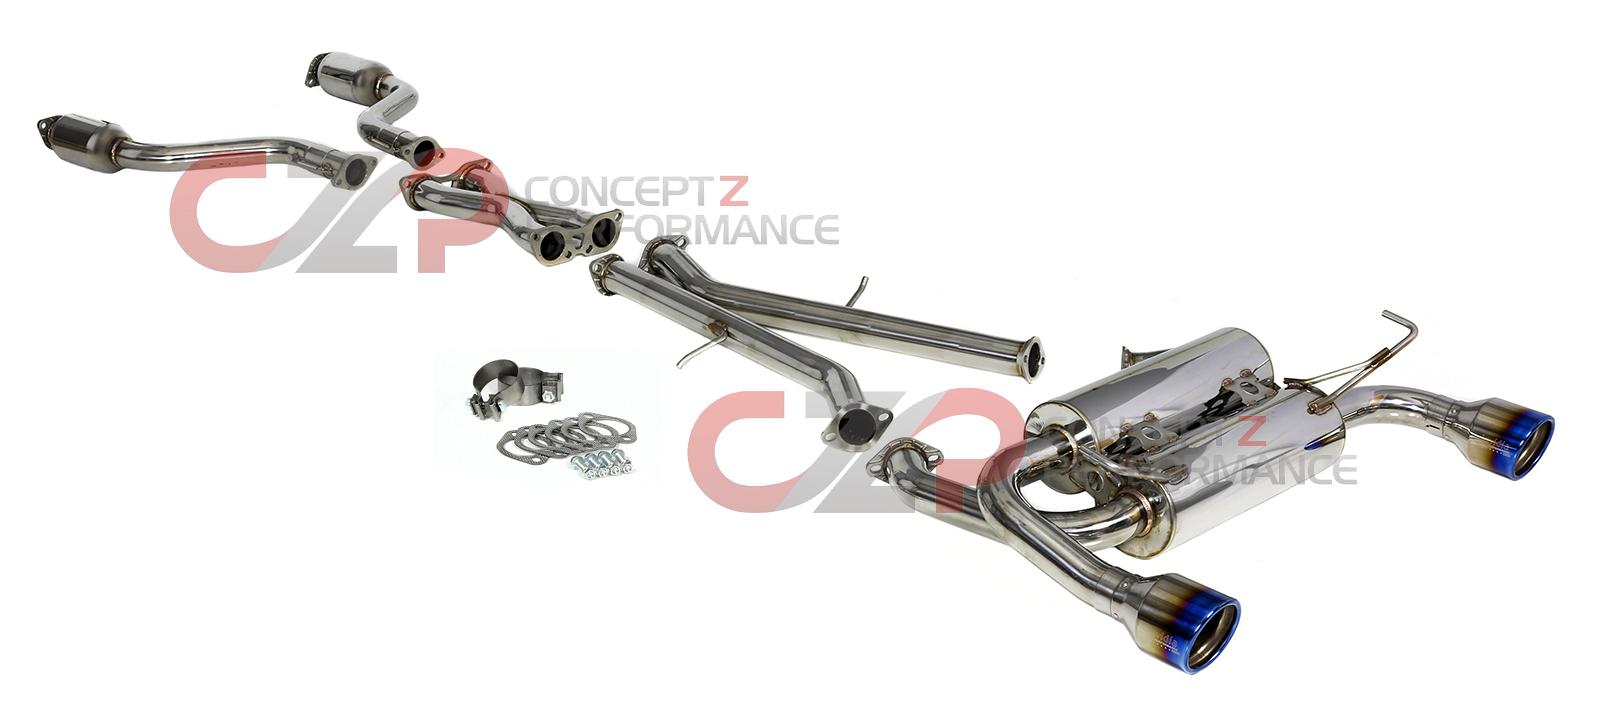 hight resolution of invidia gemini rolled titanium tip cat back exhaust system infiniti g37 q60 coupe cv36